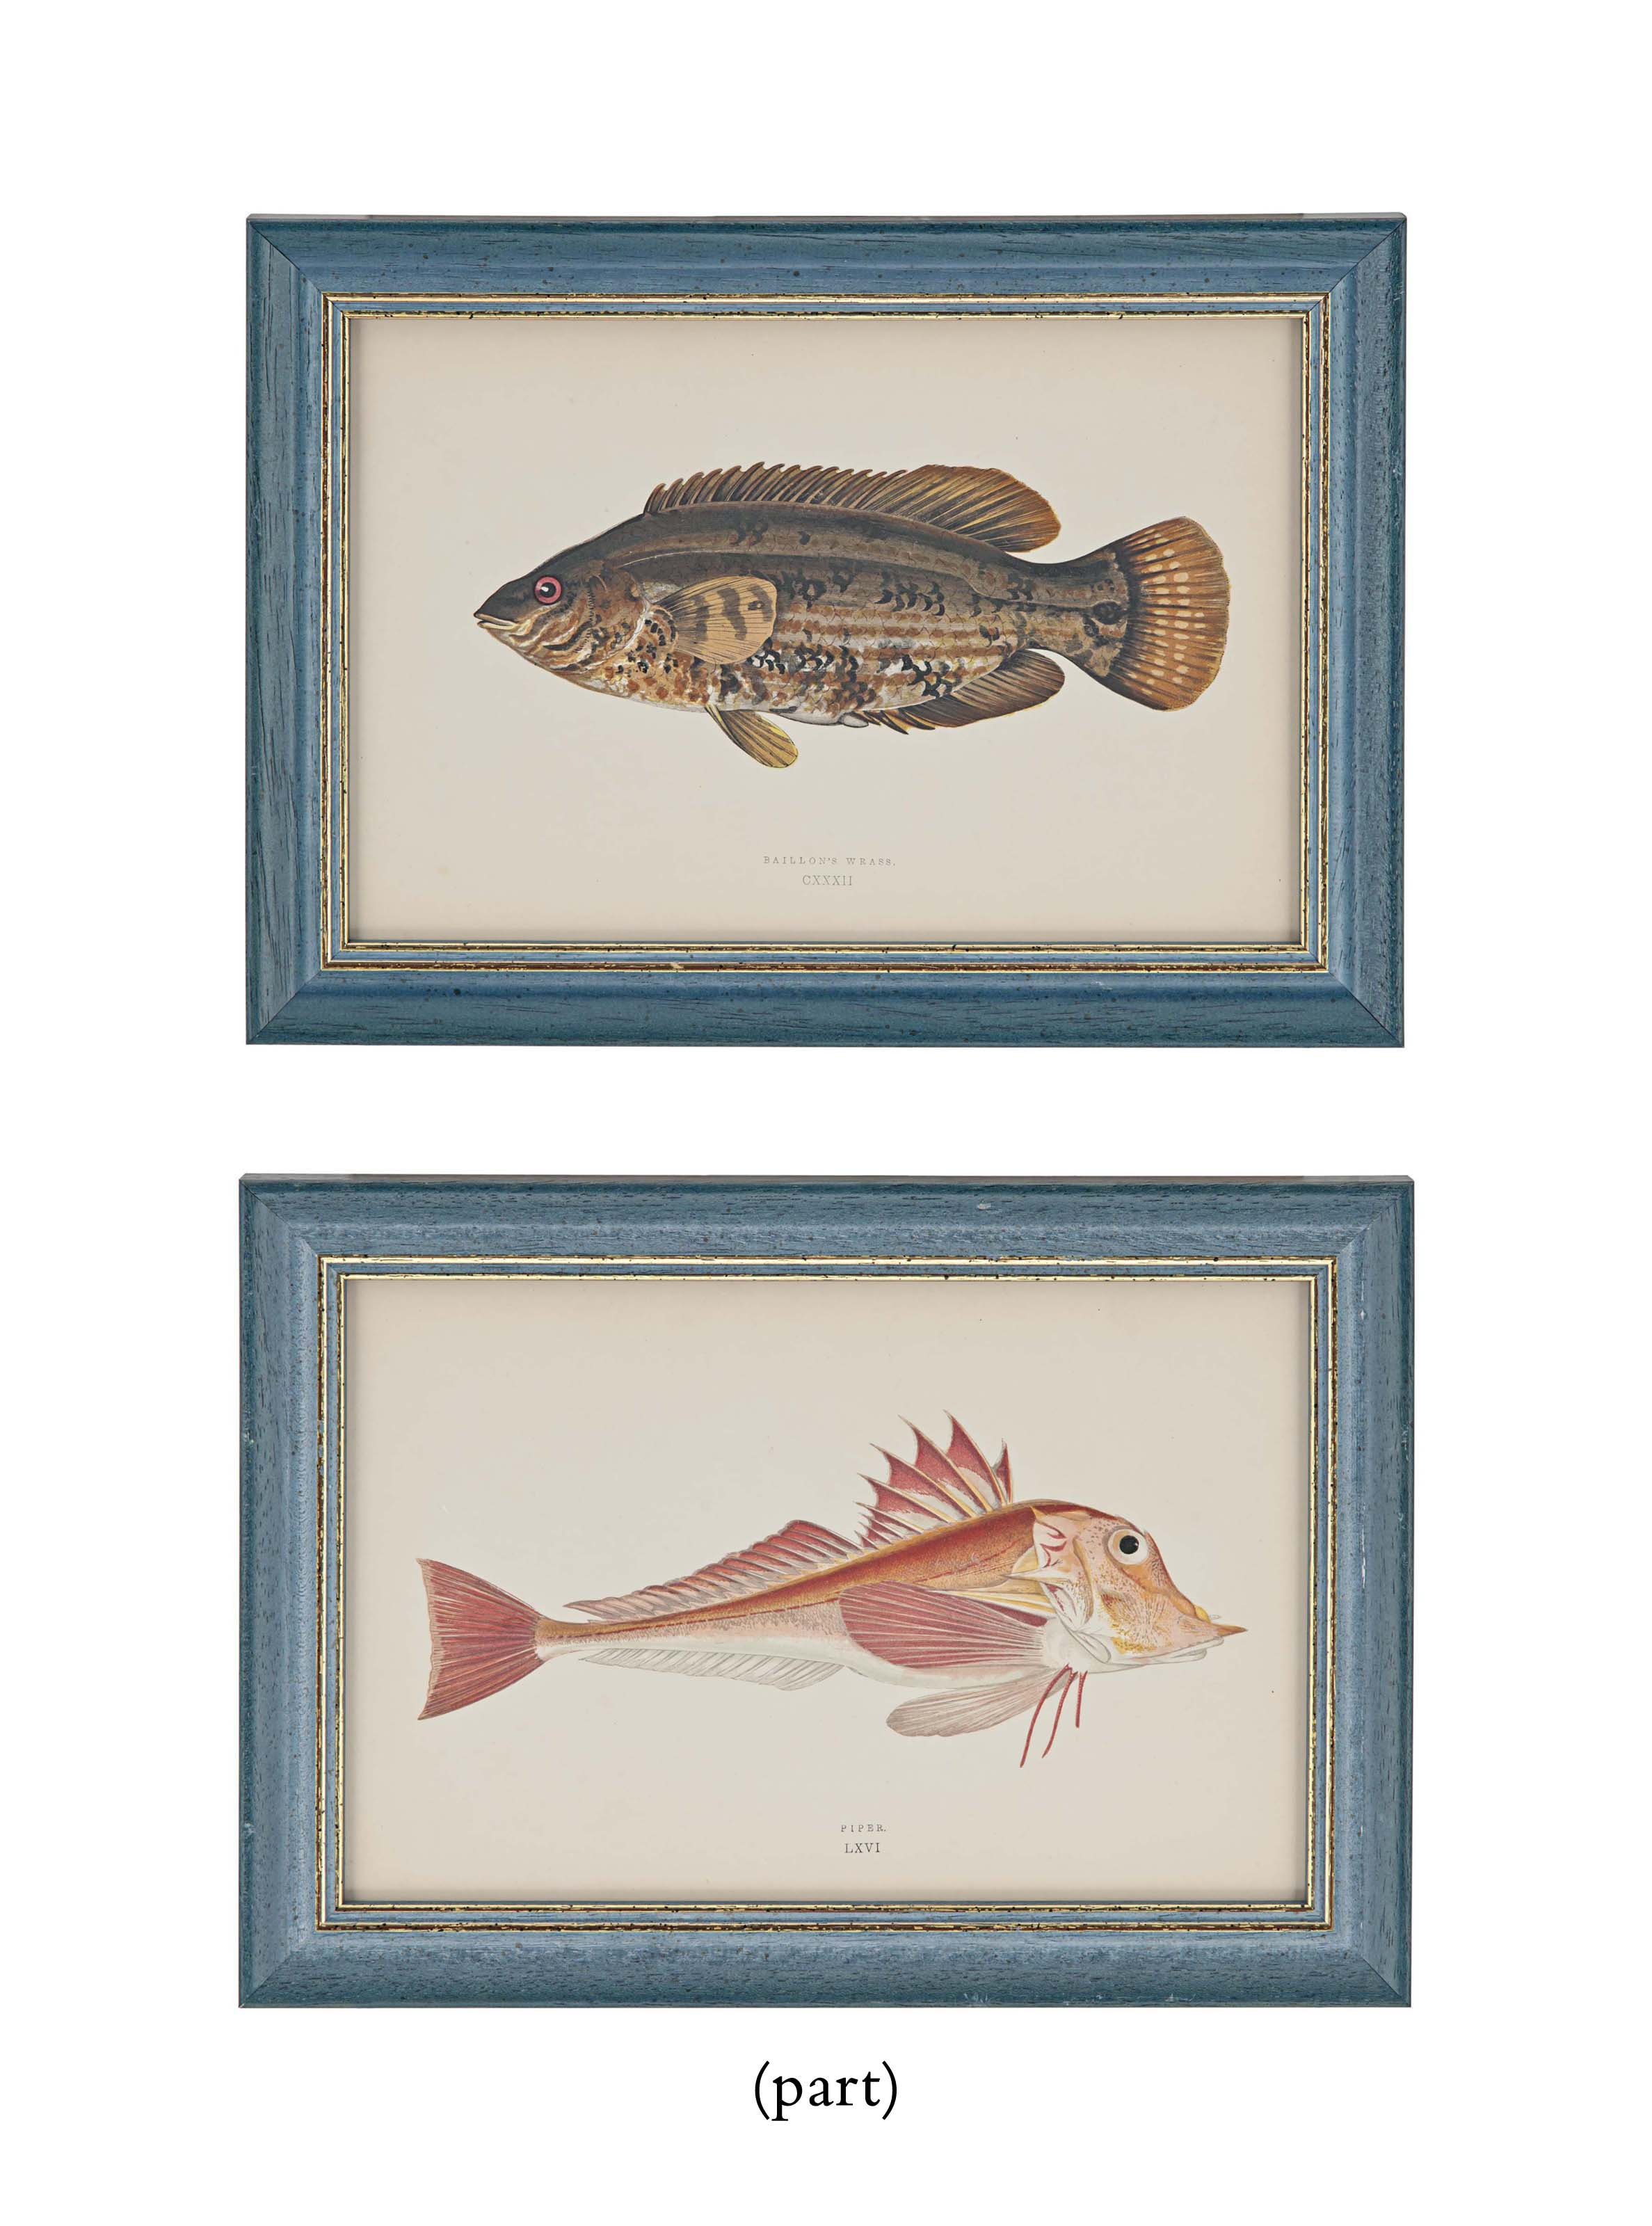 TWENTY HAND-COLOURED ENGRAVINGS OF FISH